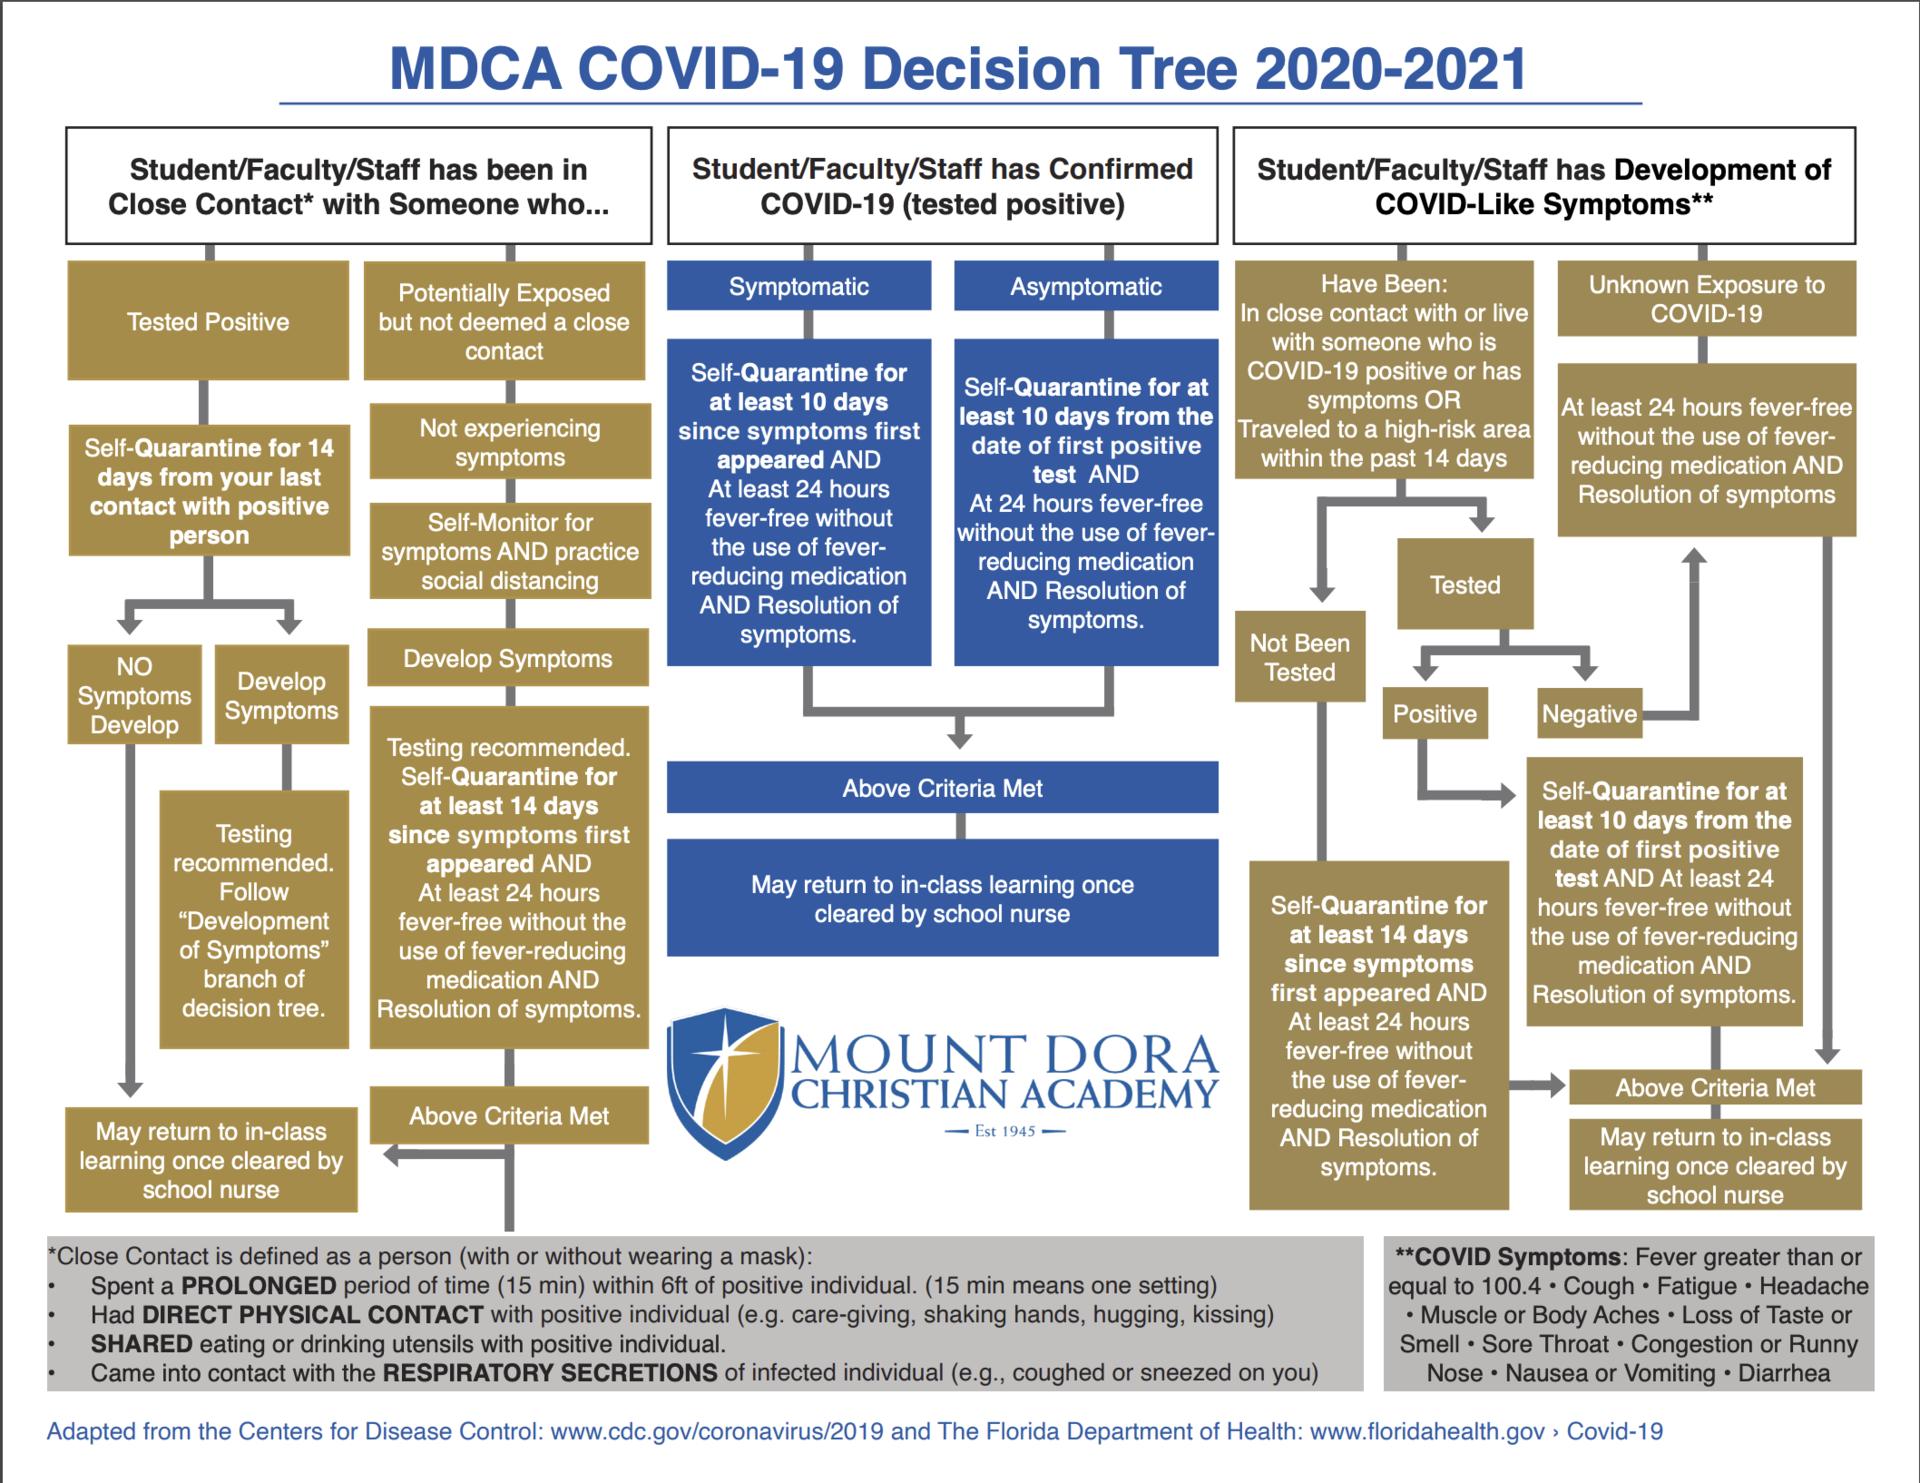 COVID-19 Decision Tree